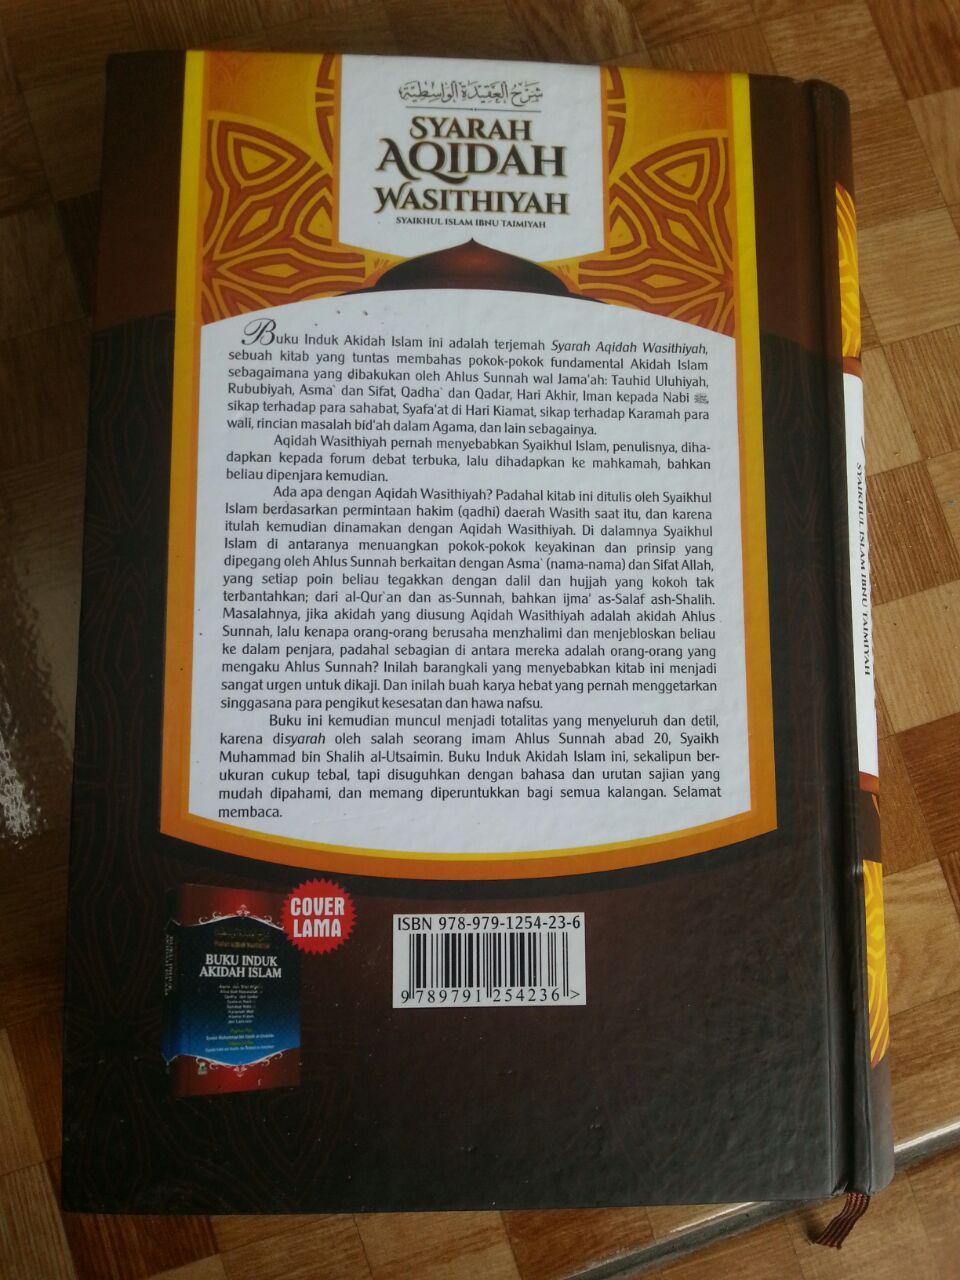 Buku Syarah Aqidah Wasithiyah Induk Akidah Islam cover 2